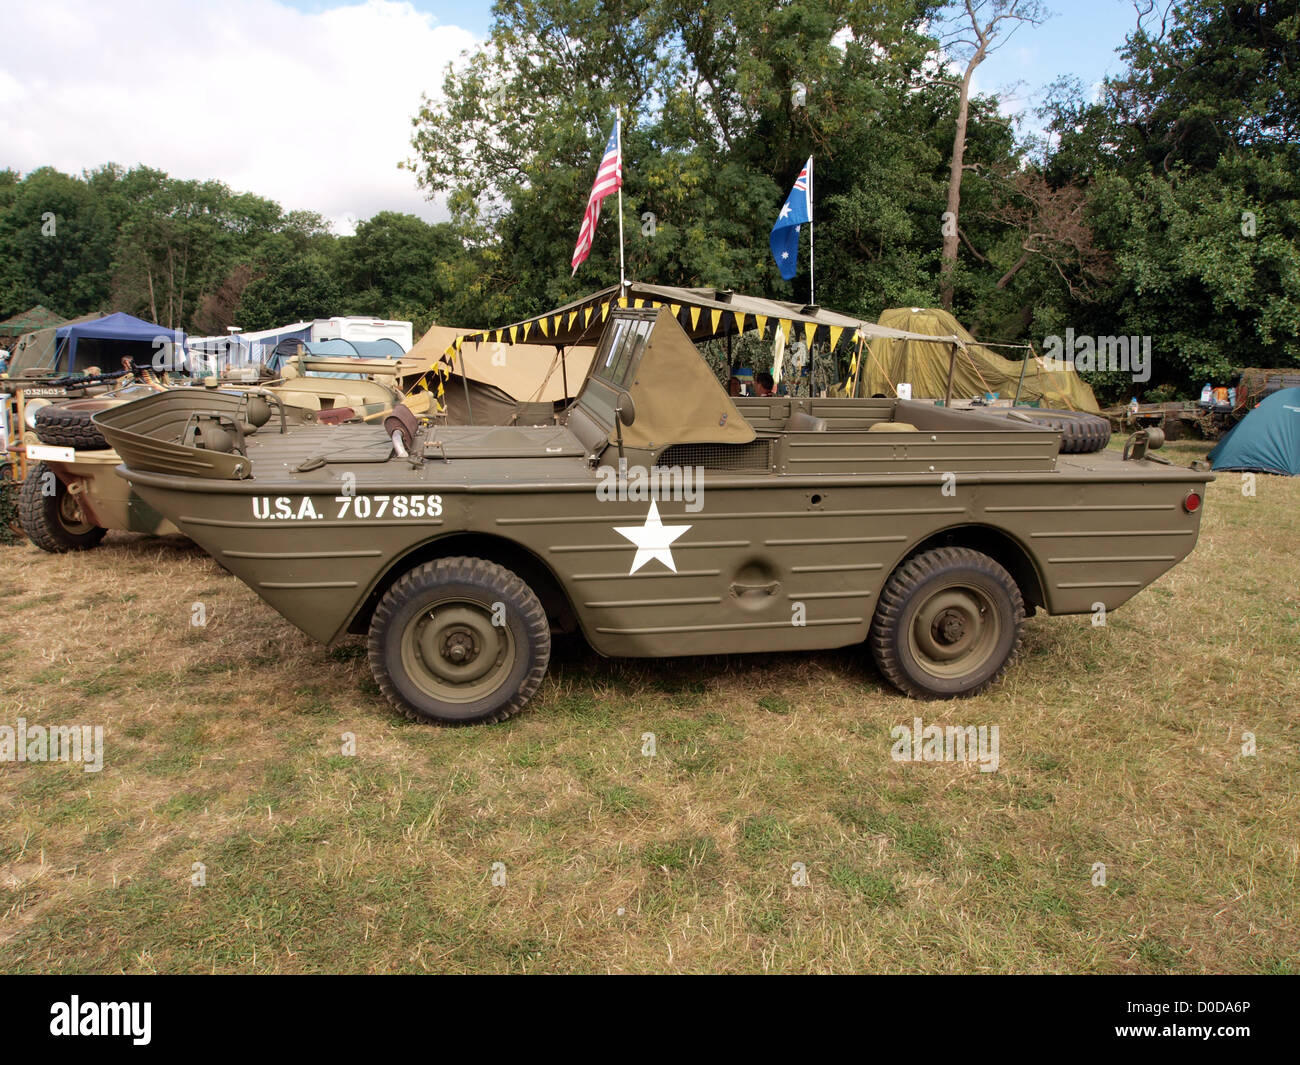 Ford GPA Amphibious Jeep Stock Photo: 51924510 - Alamy